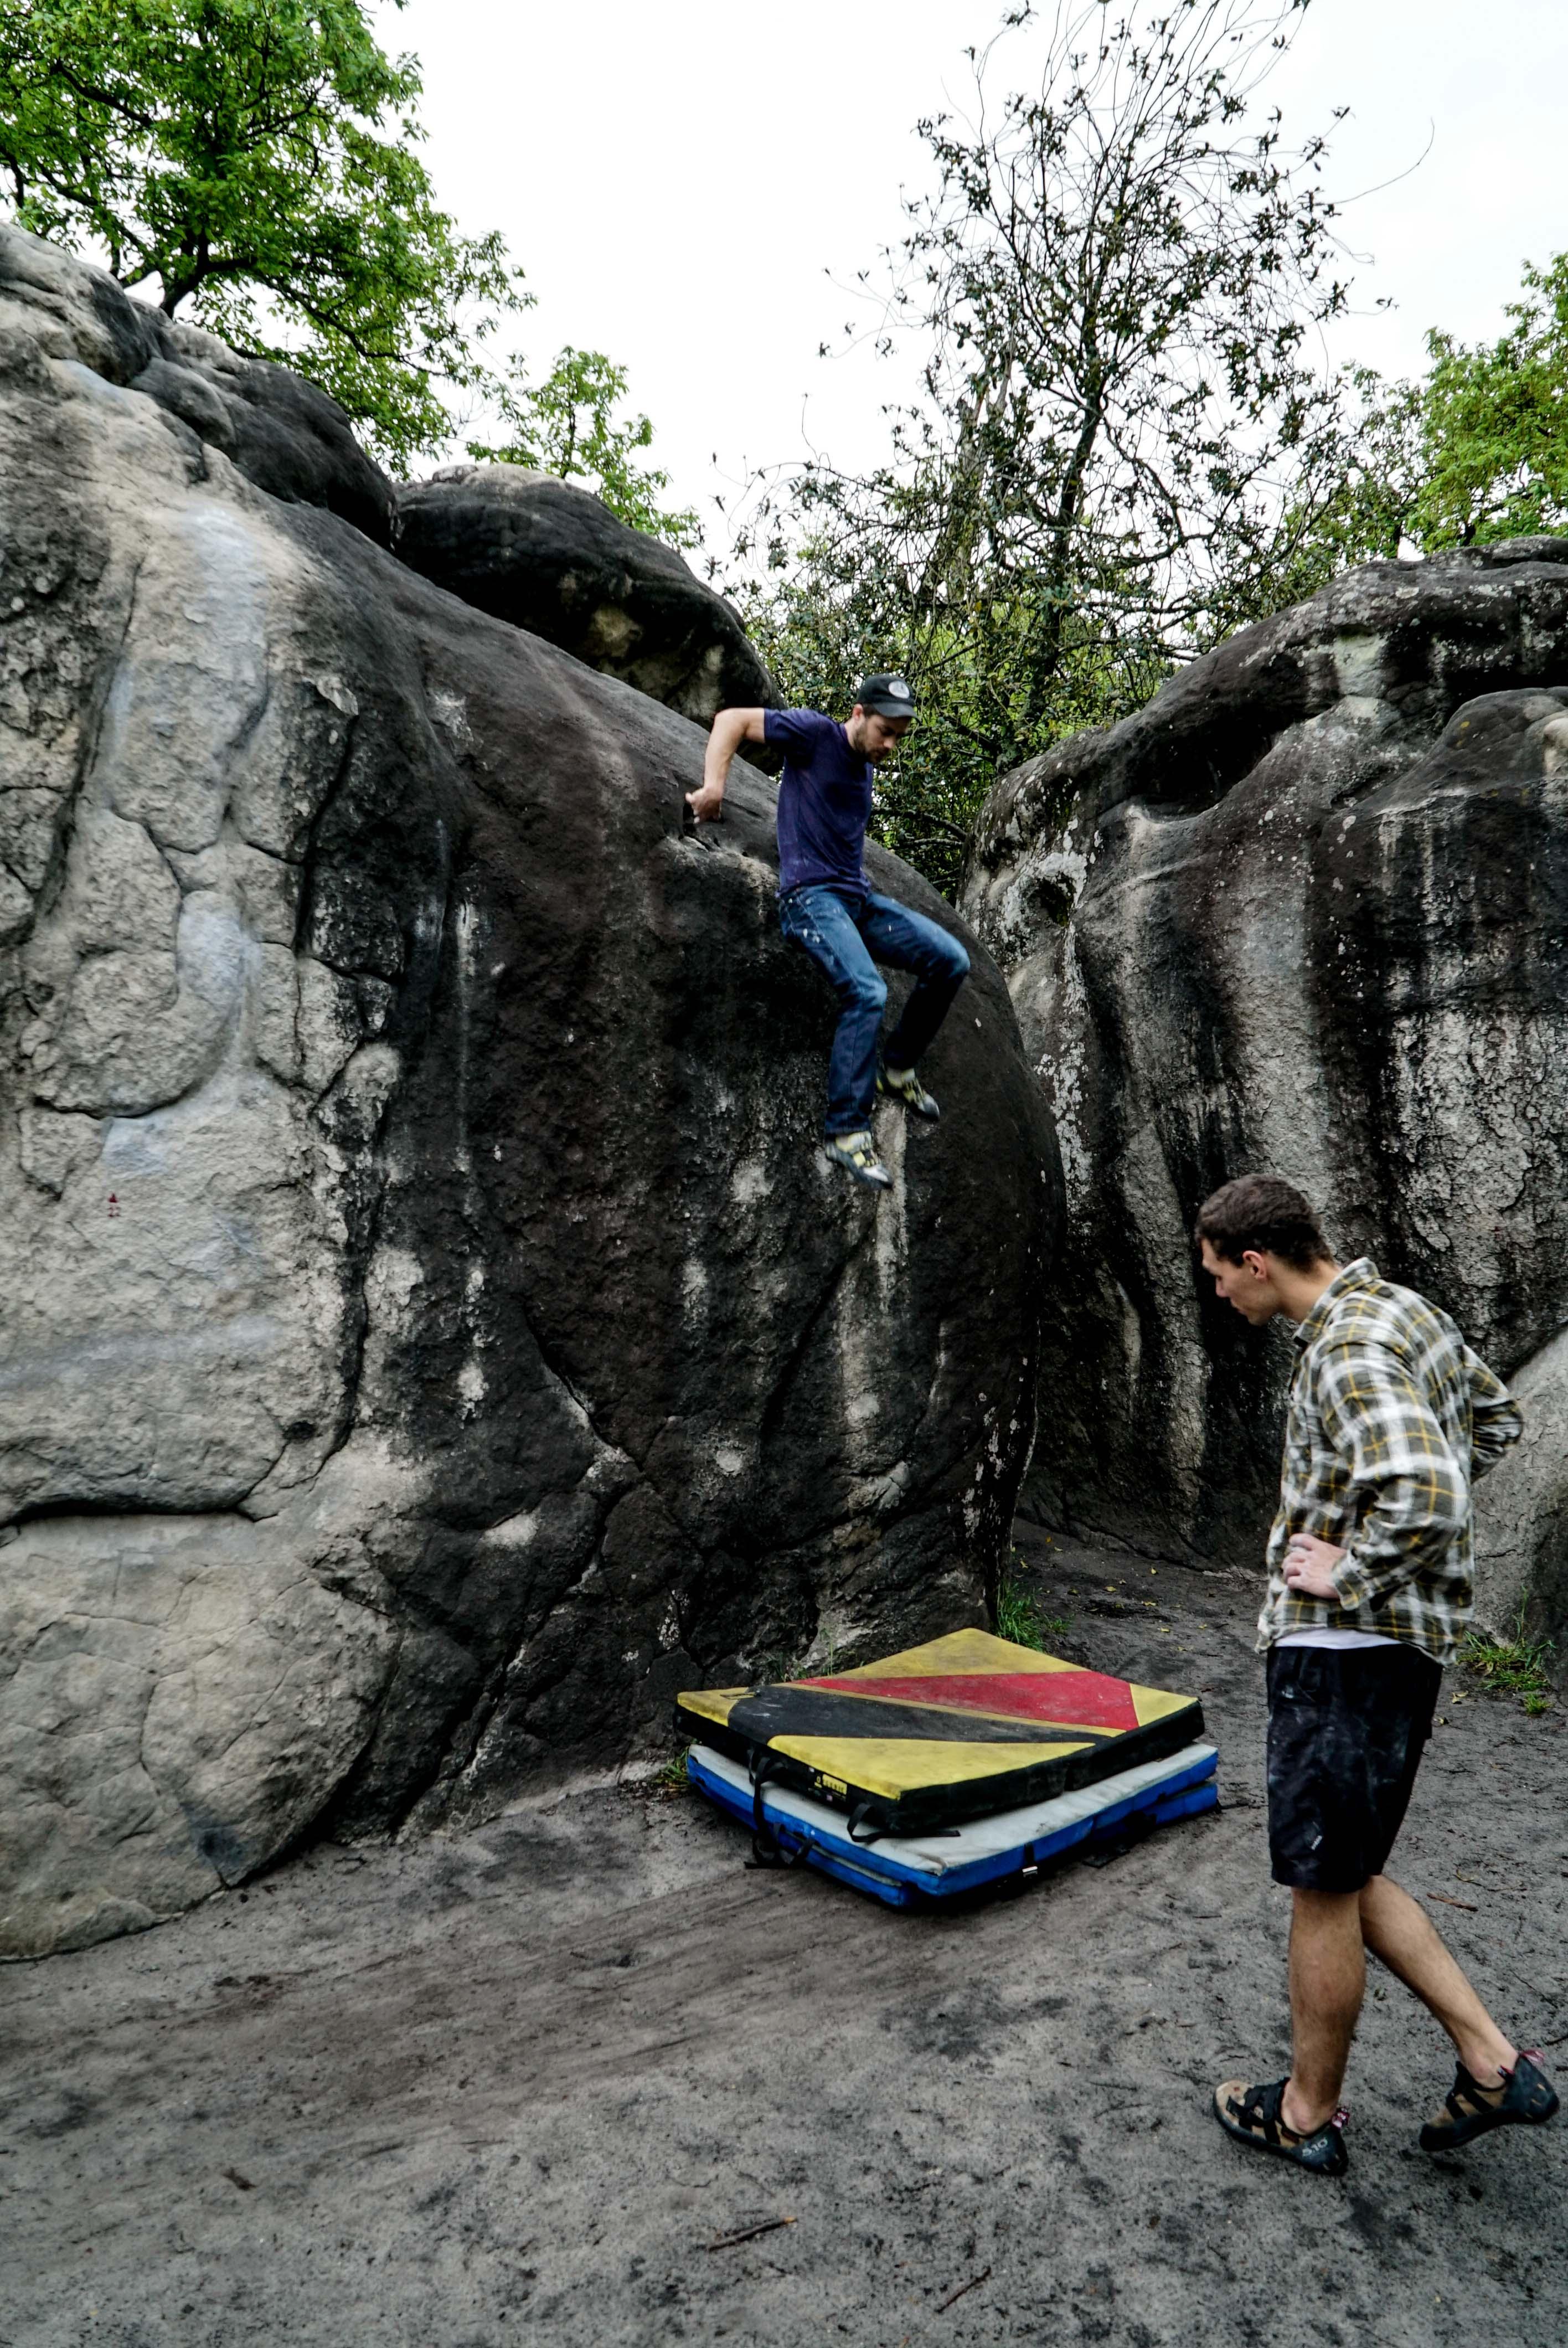 fontainbleau climbing 2016 mike brindley-33